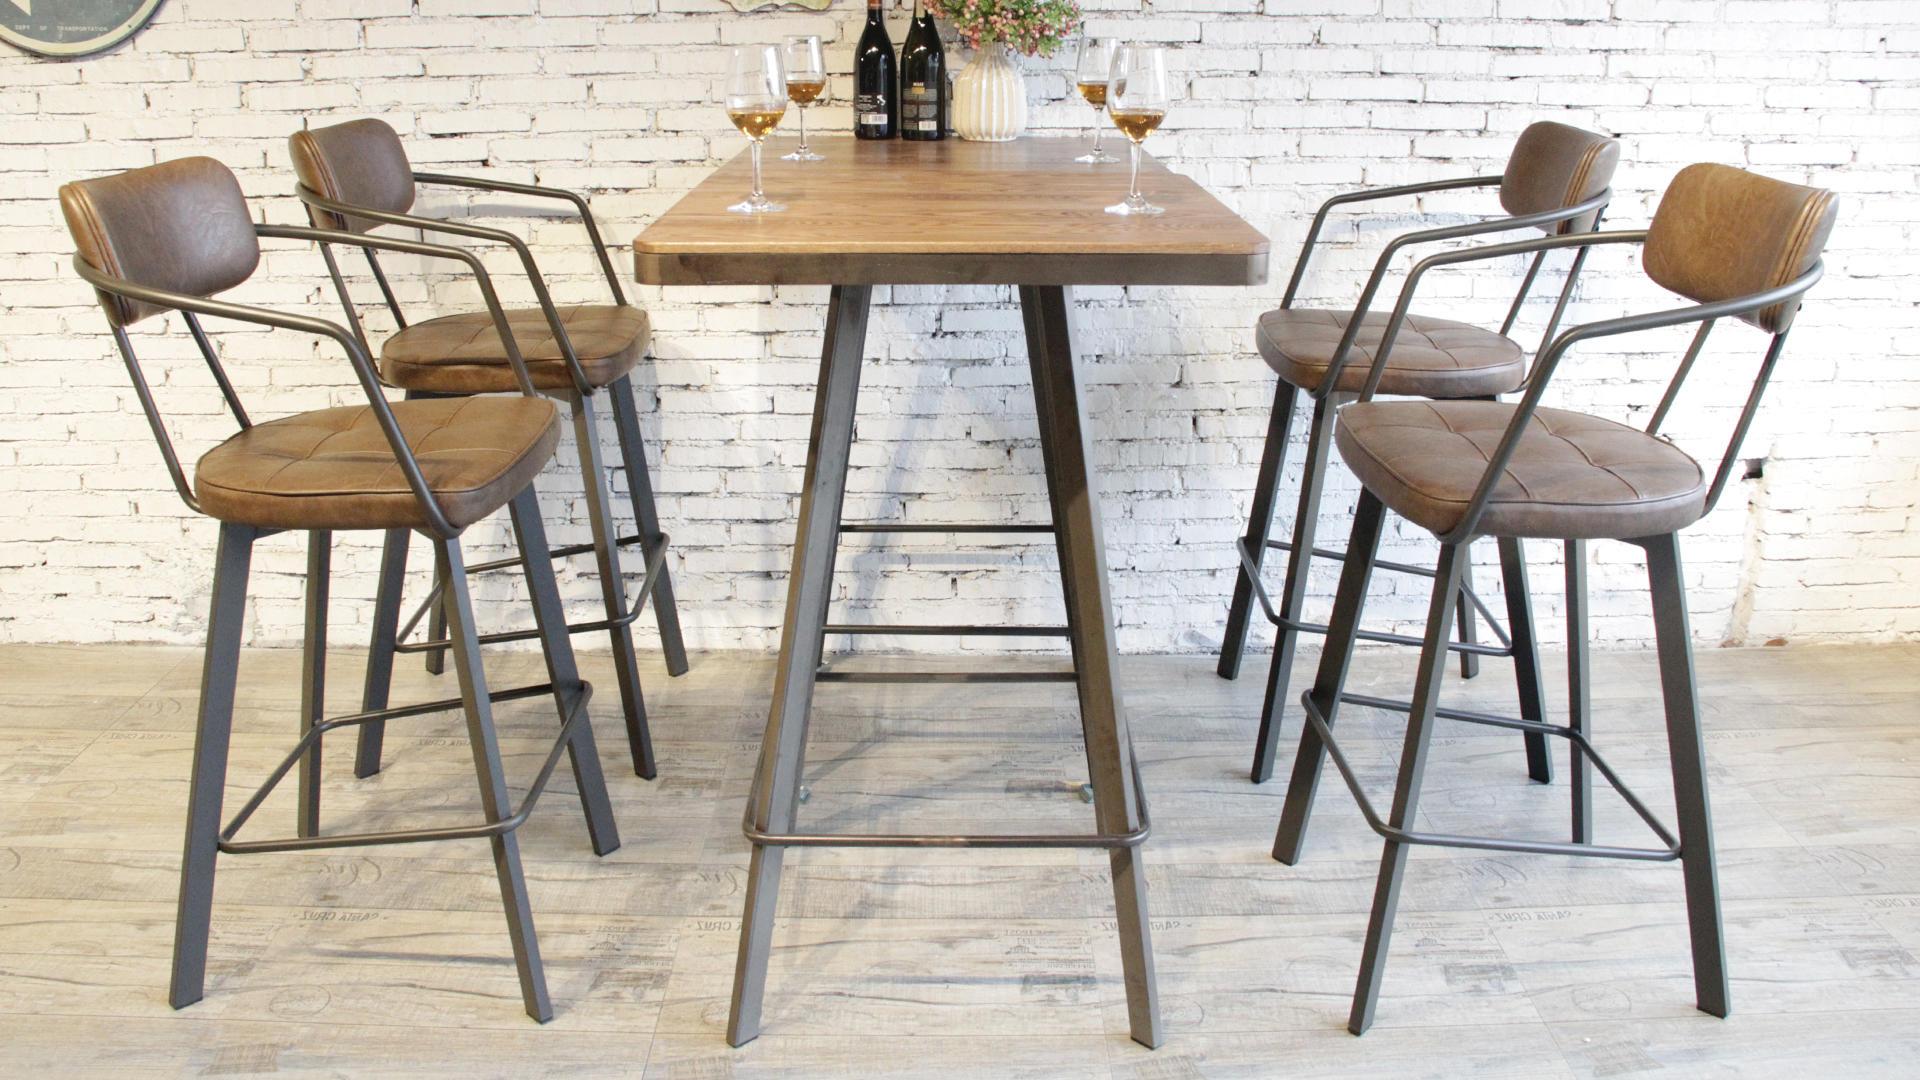 Vintige Bar Furniture Metal Footrest Pu Leather Bar High Chair 795M-H75-STPU